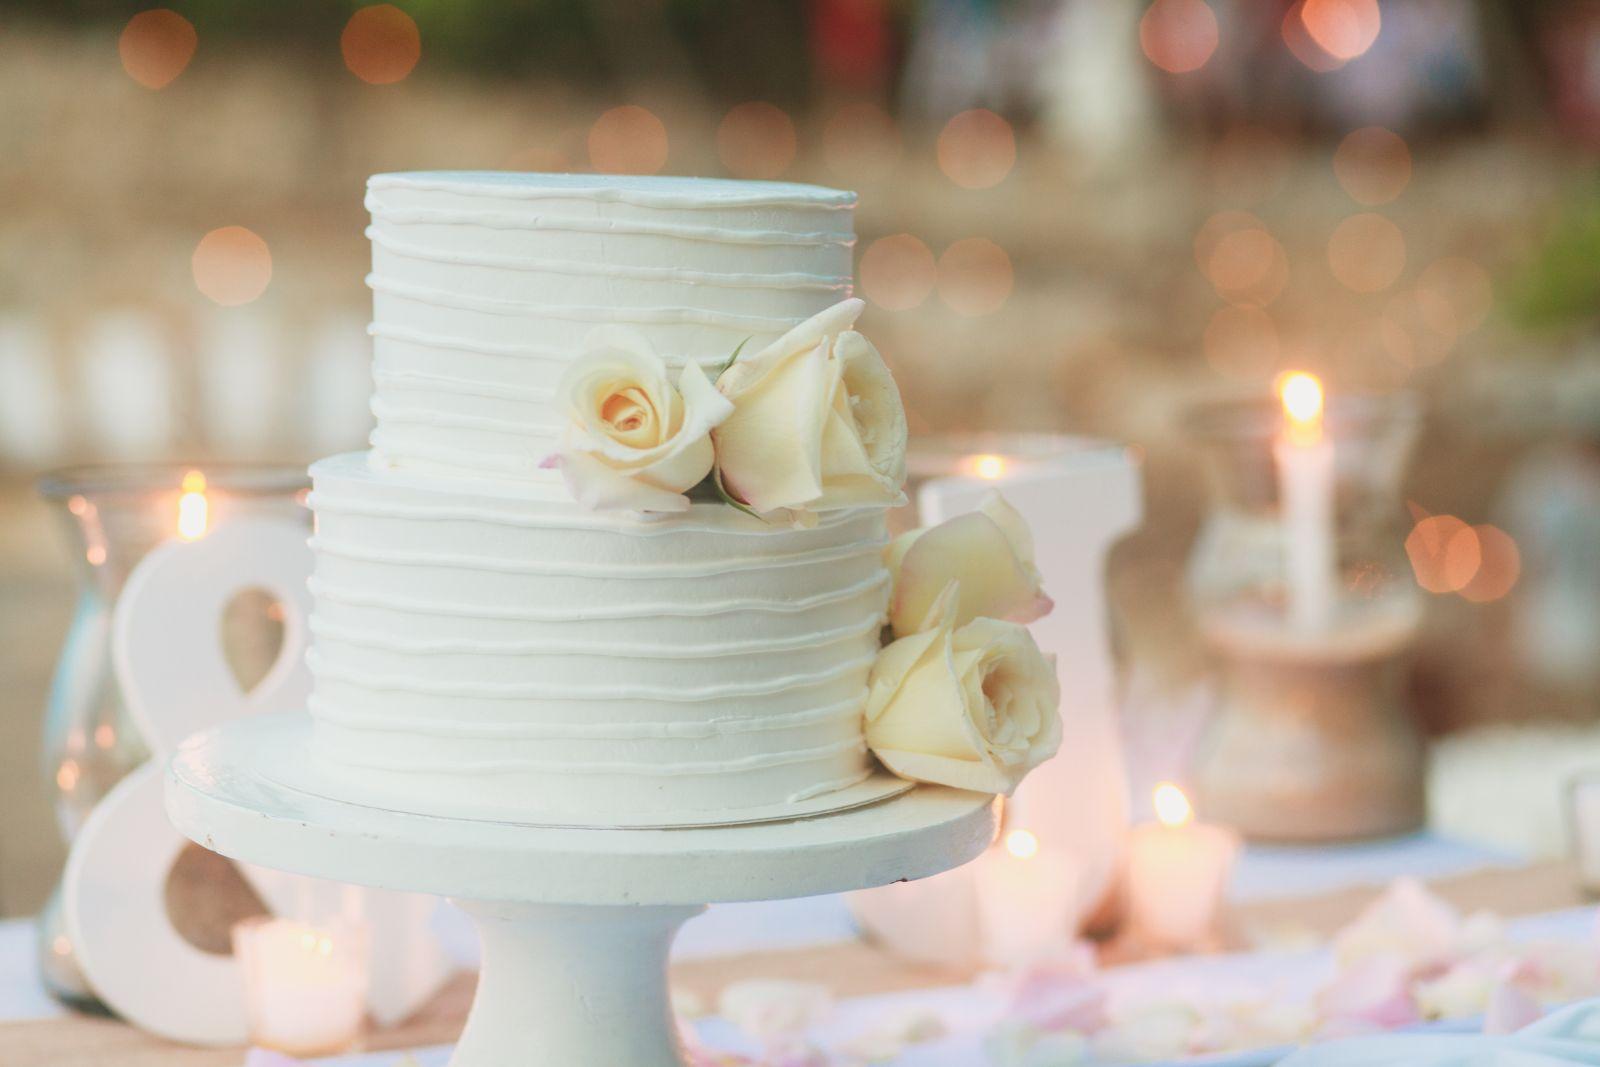 Wedding cakes- Inspiration,decorations,themes..